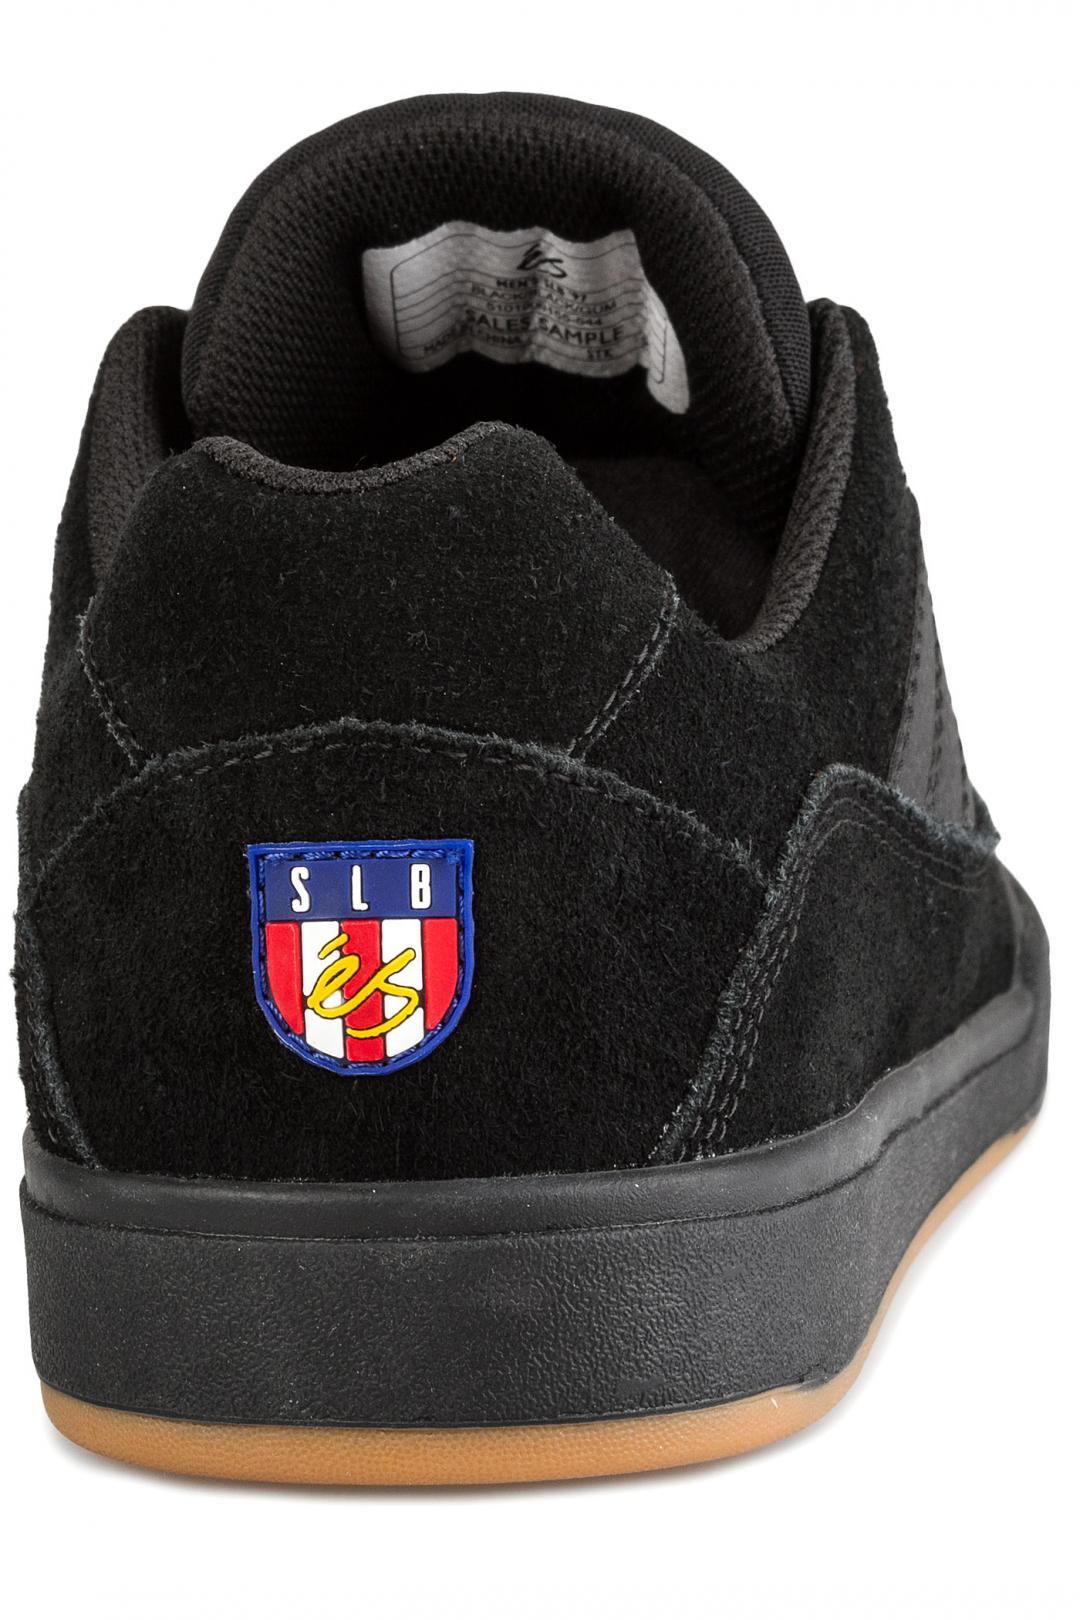 Uomo éS SLB '97 black black gum | Sneaker